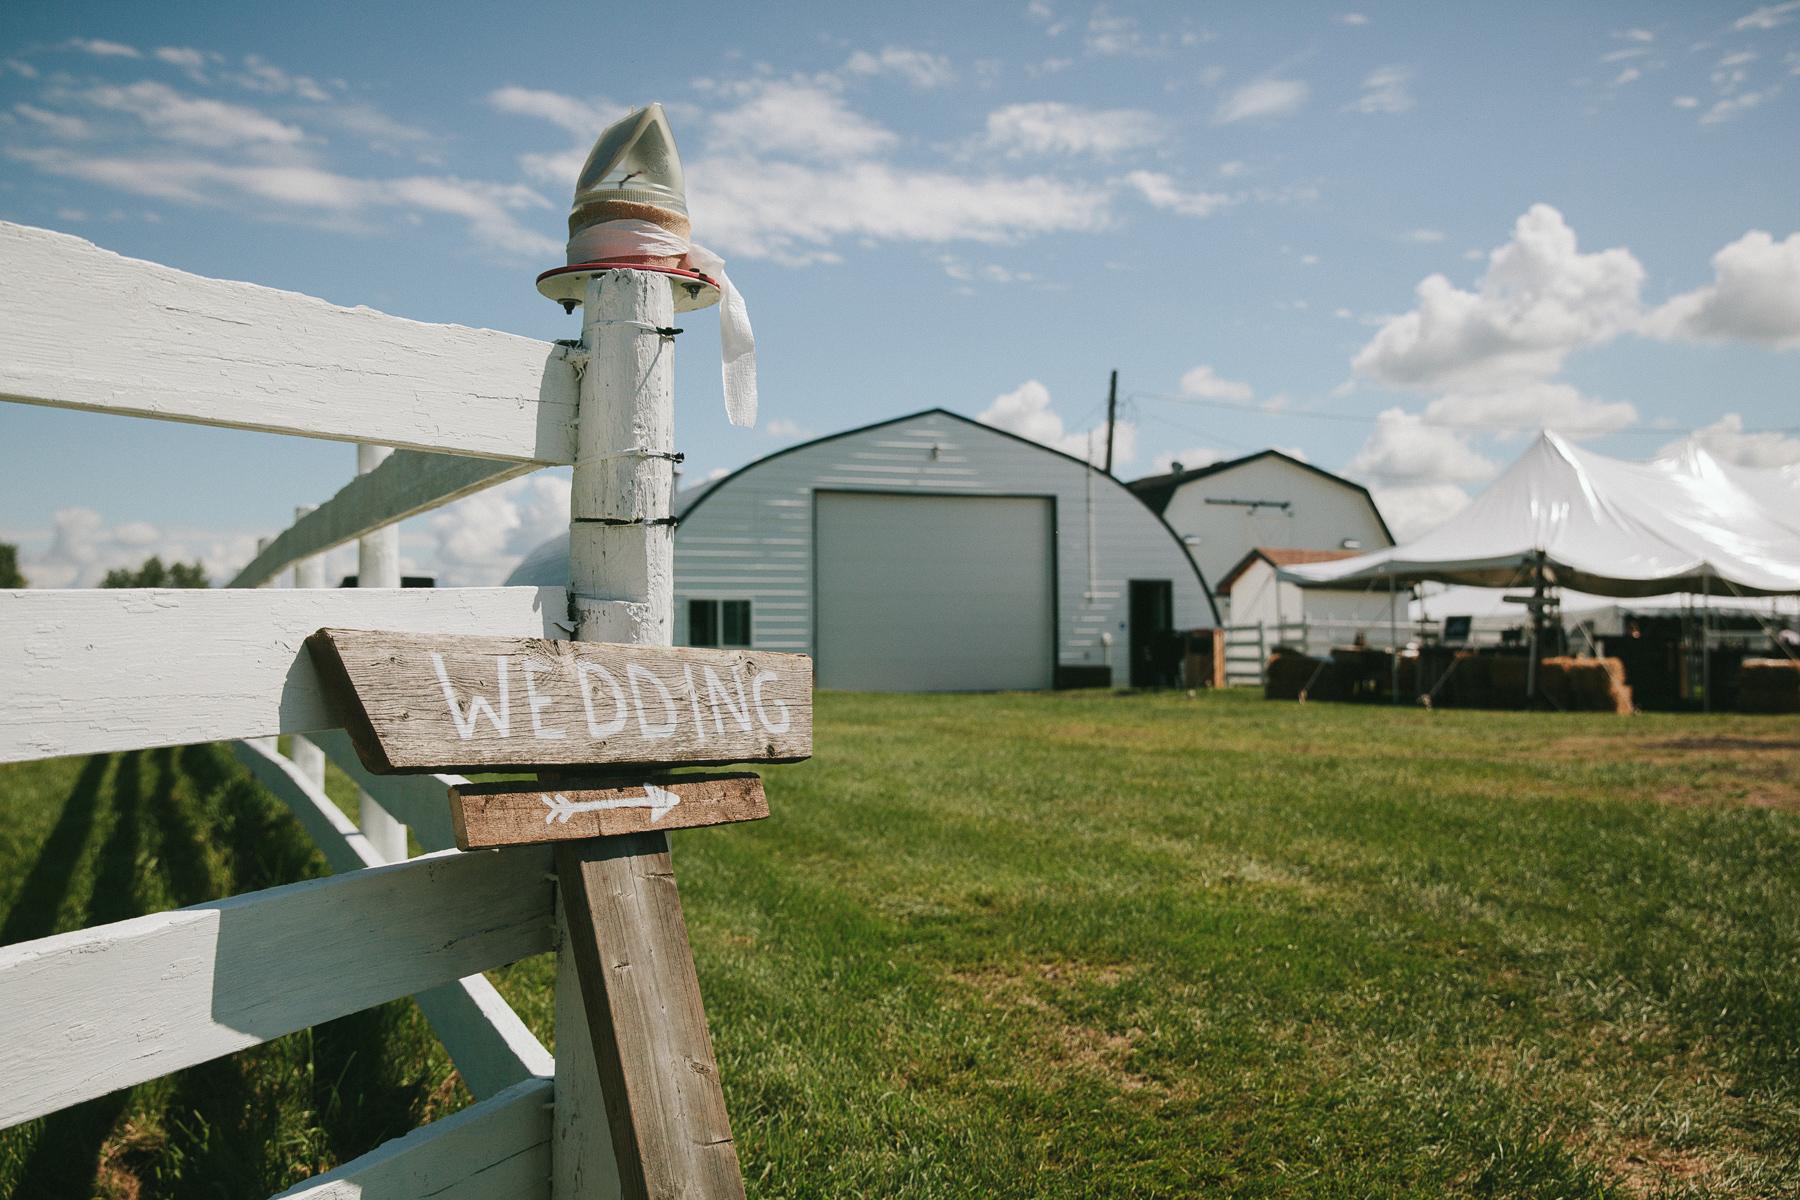 alberta-farm-wedding-photographer-rp-wj-001.jpg